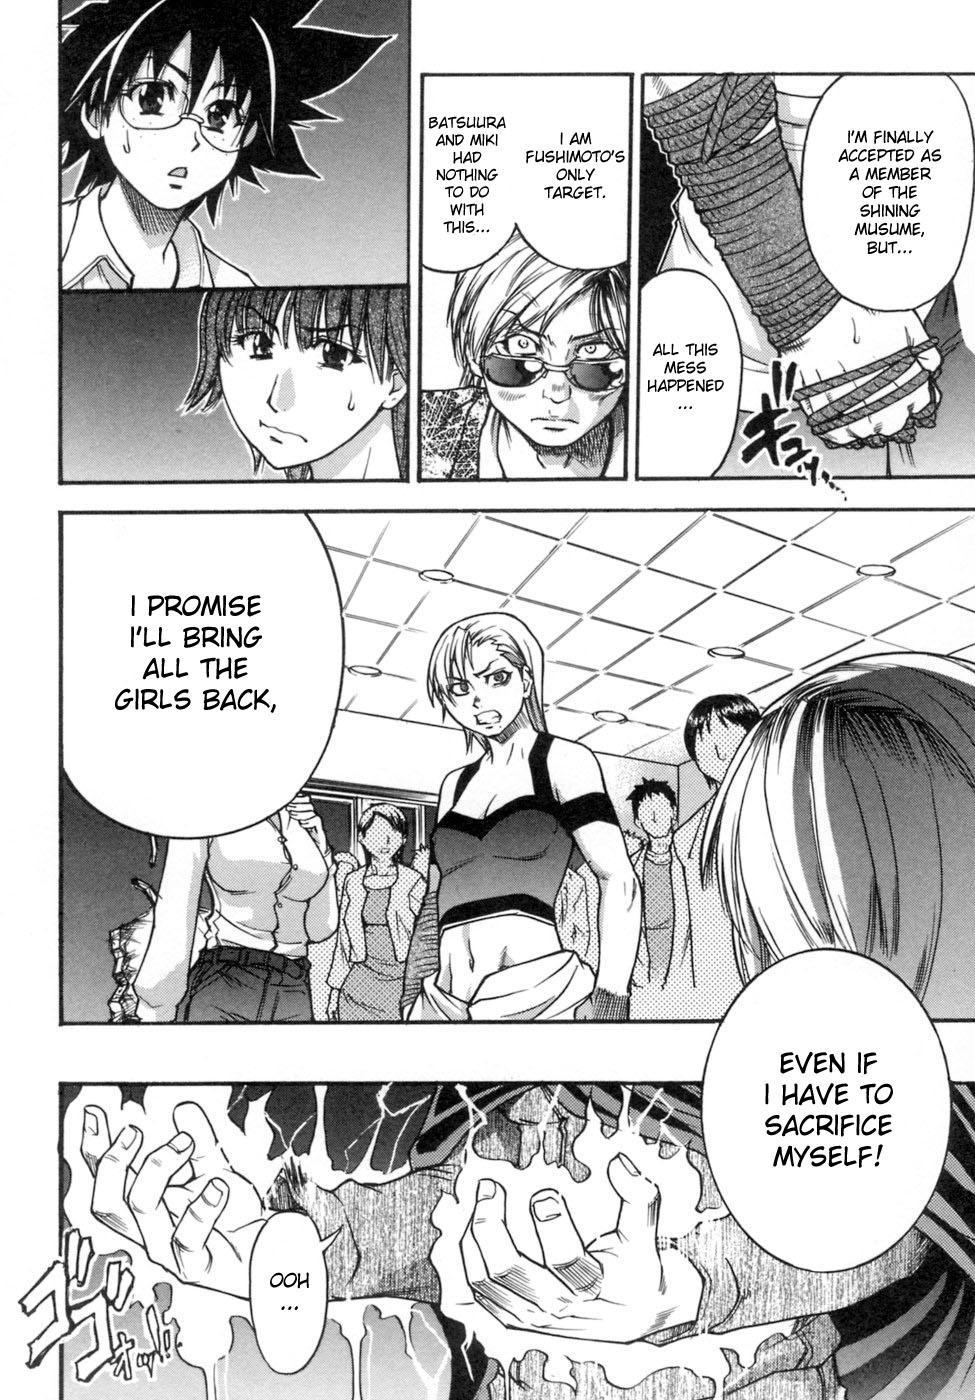 Shining Musume. 5. Five Sense of Love 126